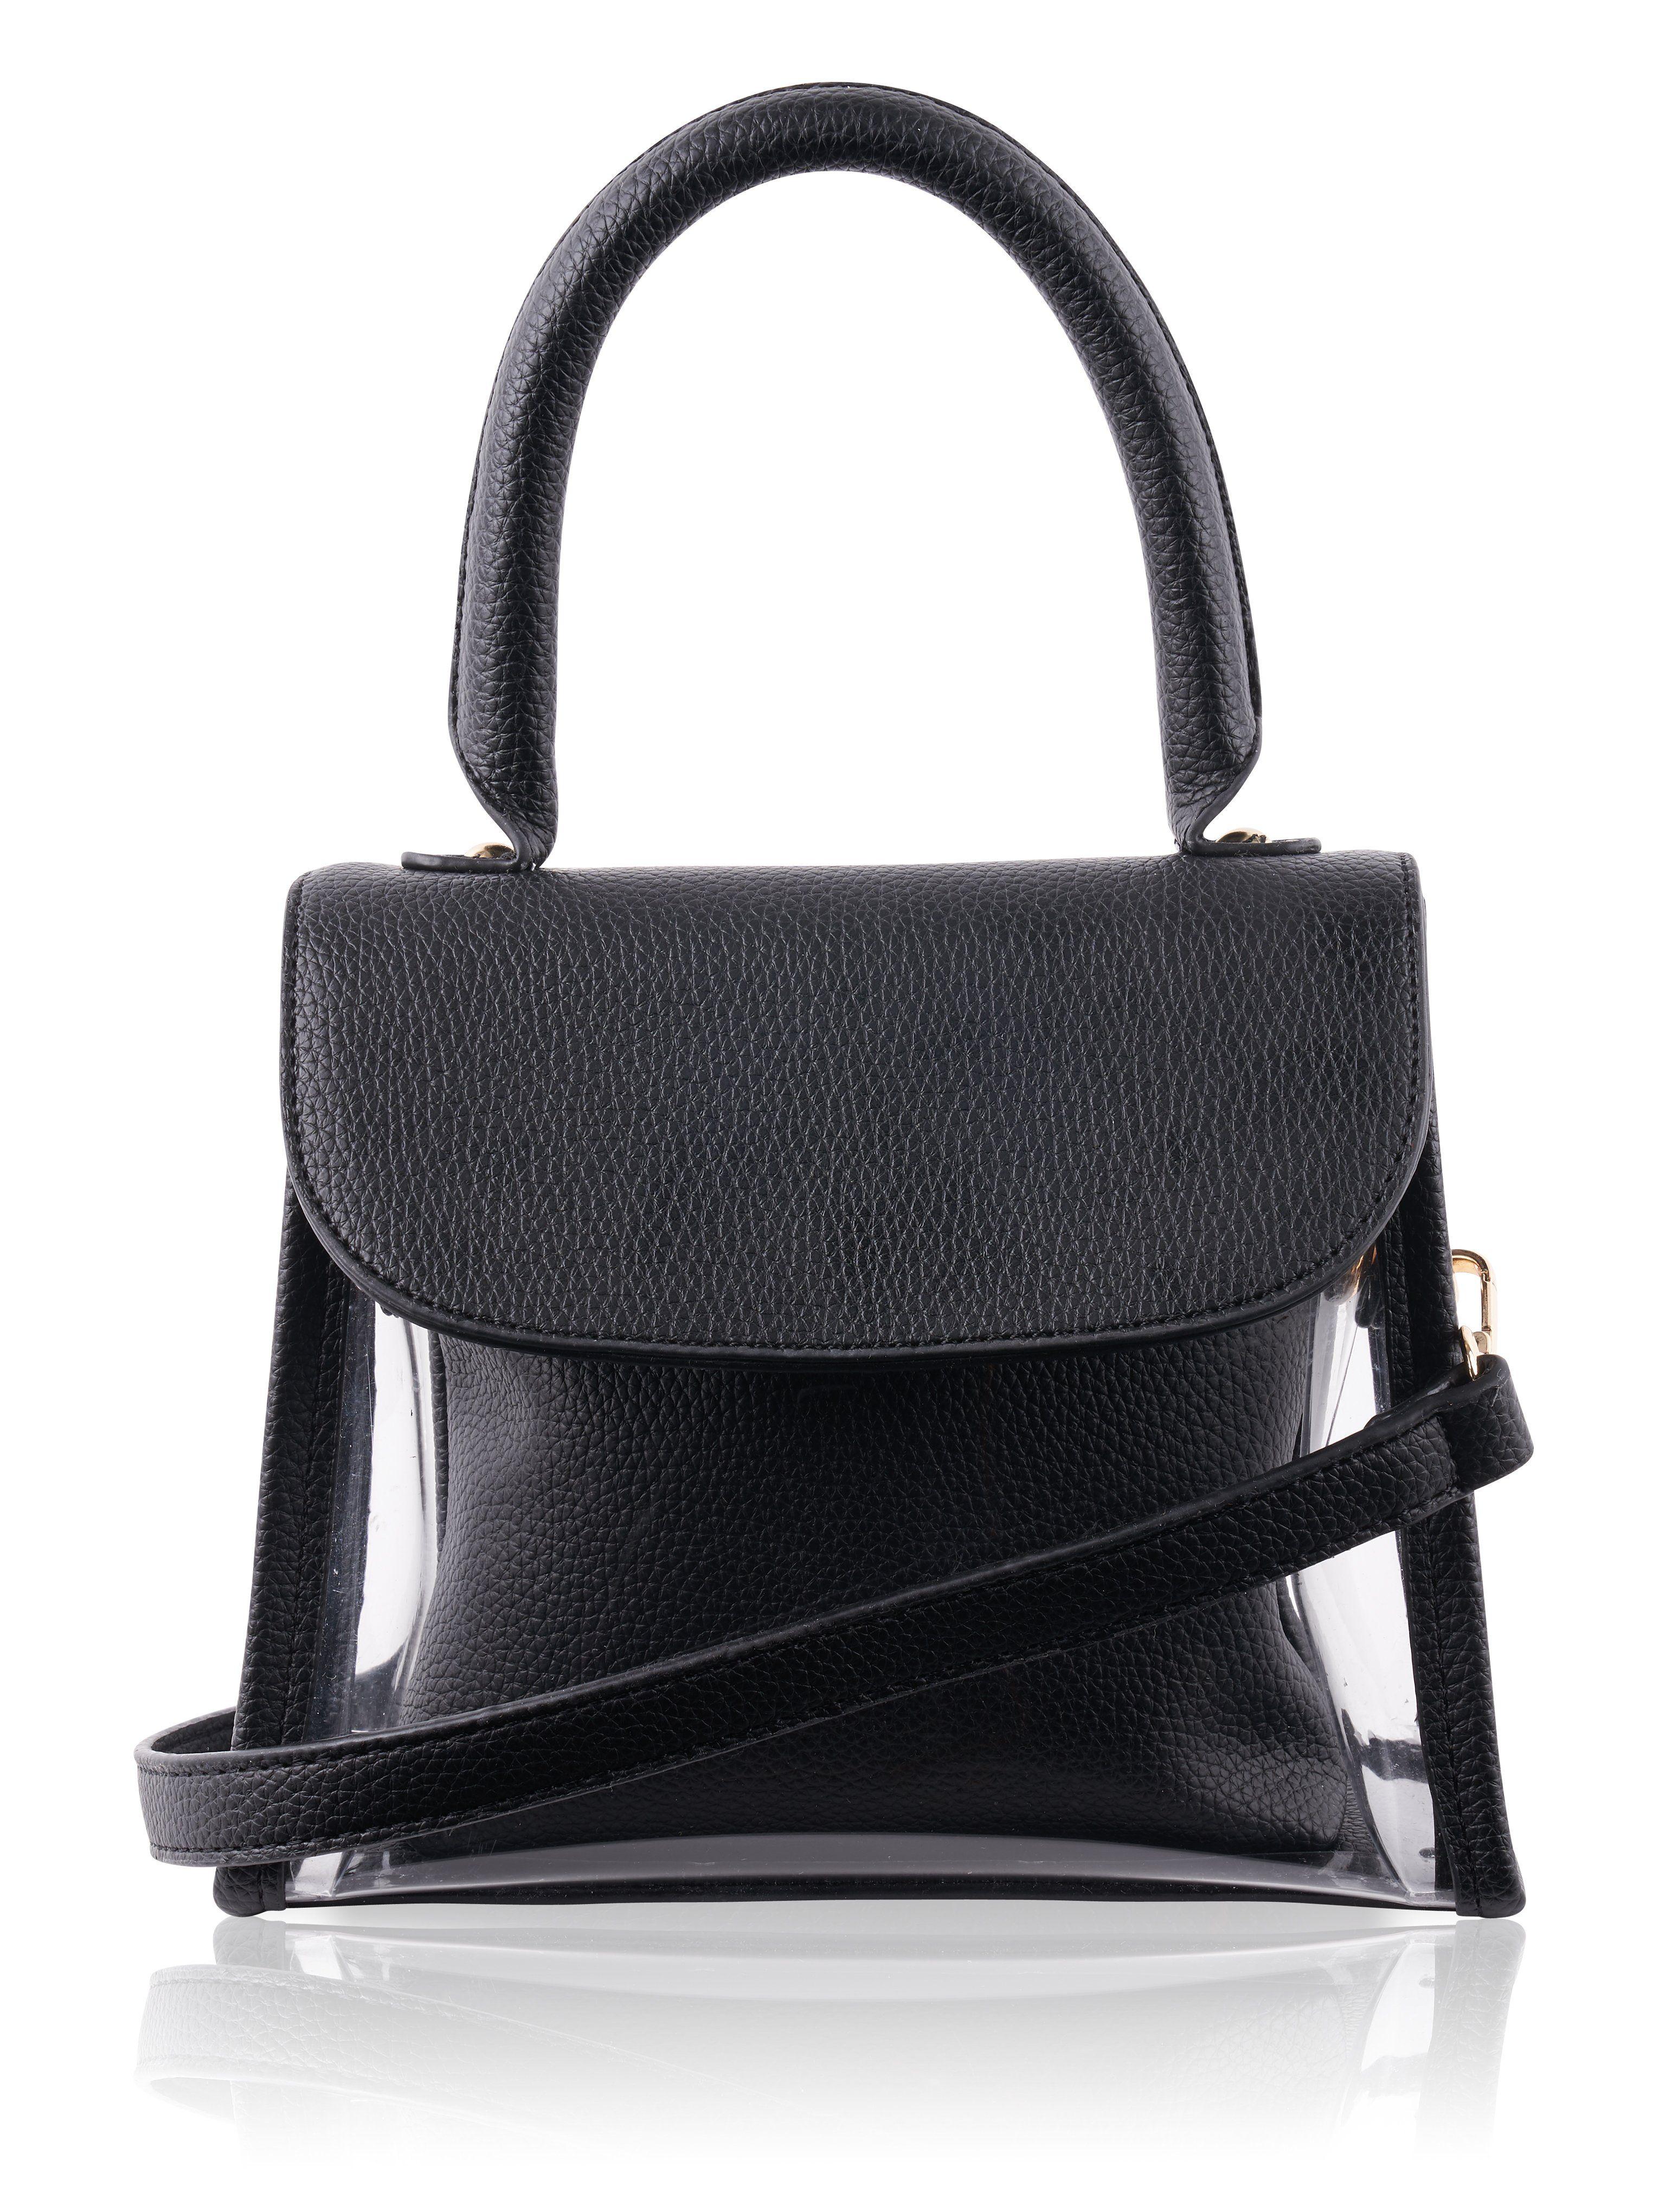 0e8f4f516cd8 Mini PVC Top Handle Bag in Black